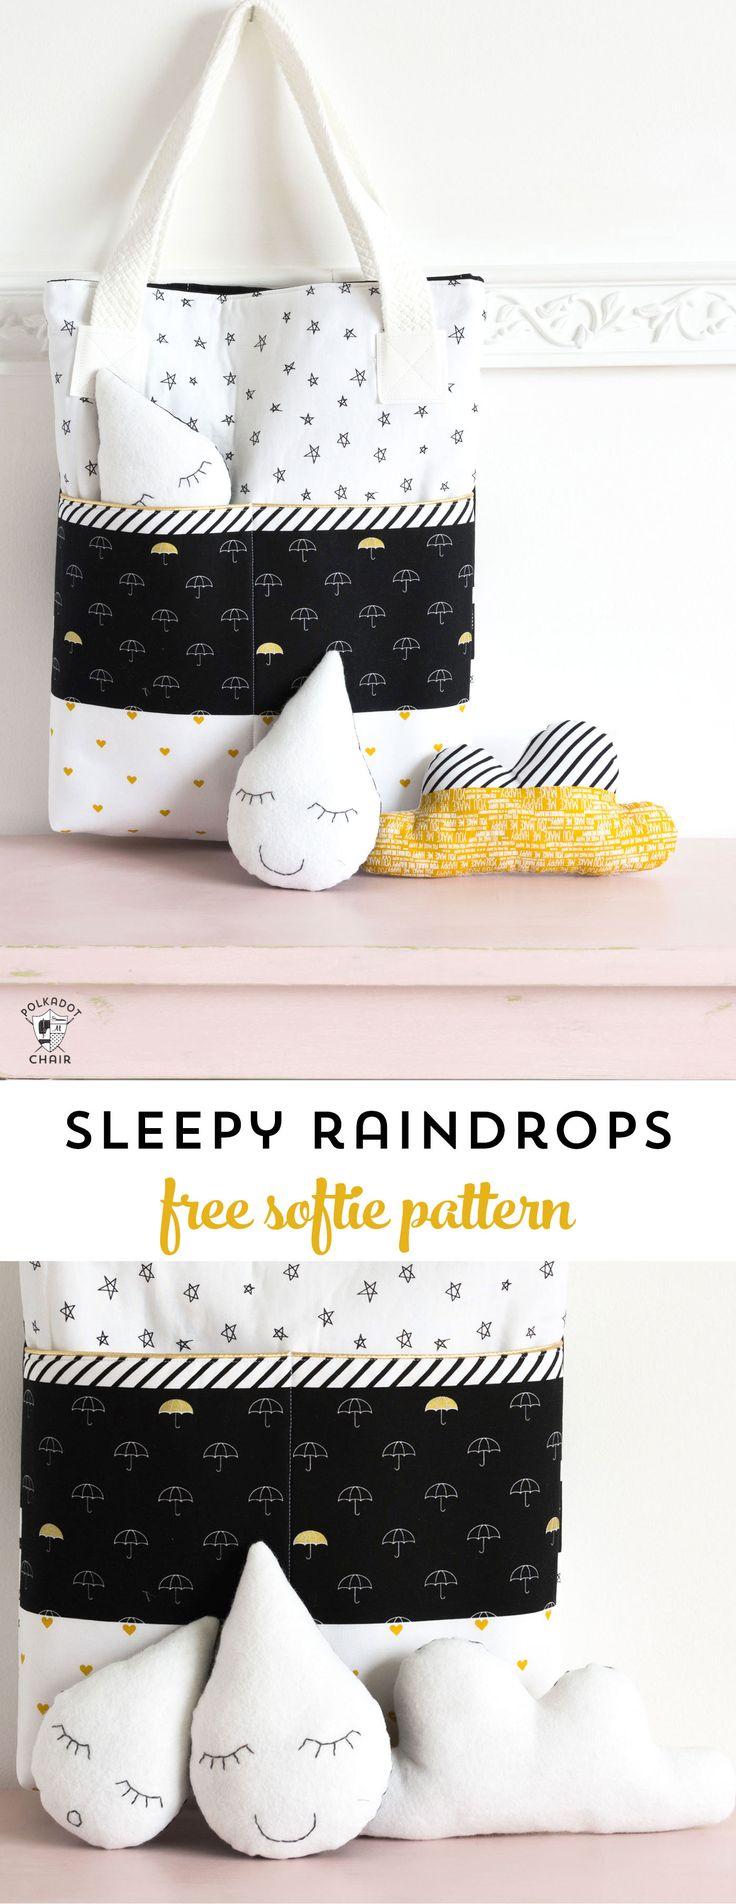 Sleepy Raindrops; a free softie sewing pattern